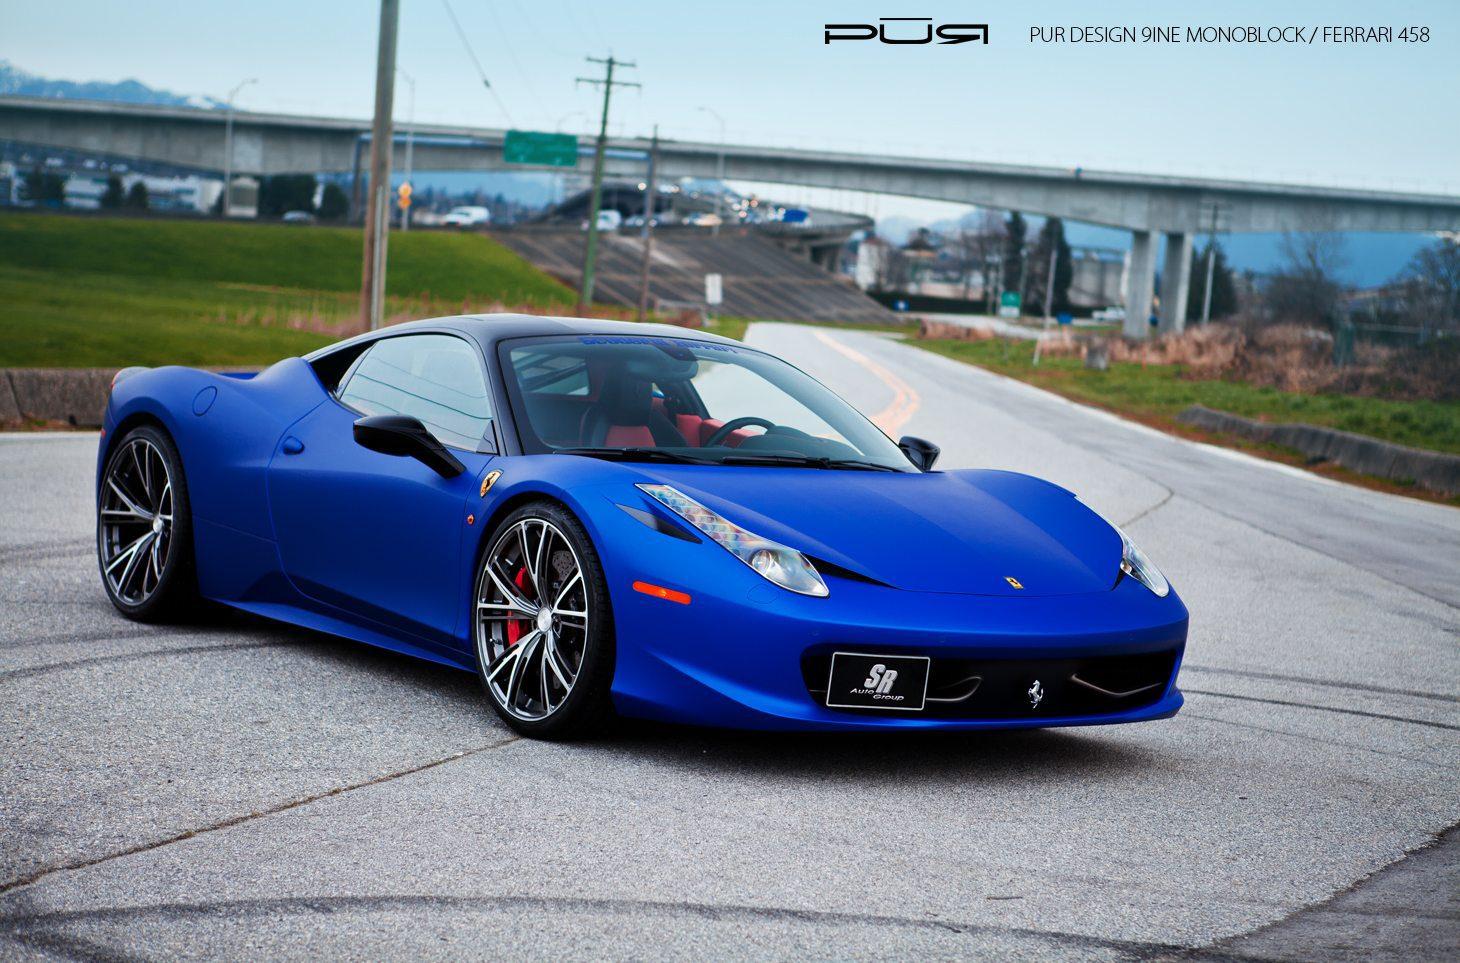 blue ferrari wallpaper matte blue ferrari 458 italia - Ferrari 458 Blue Wallpaper